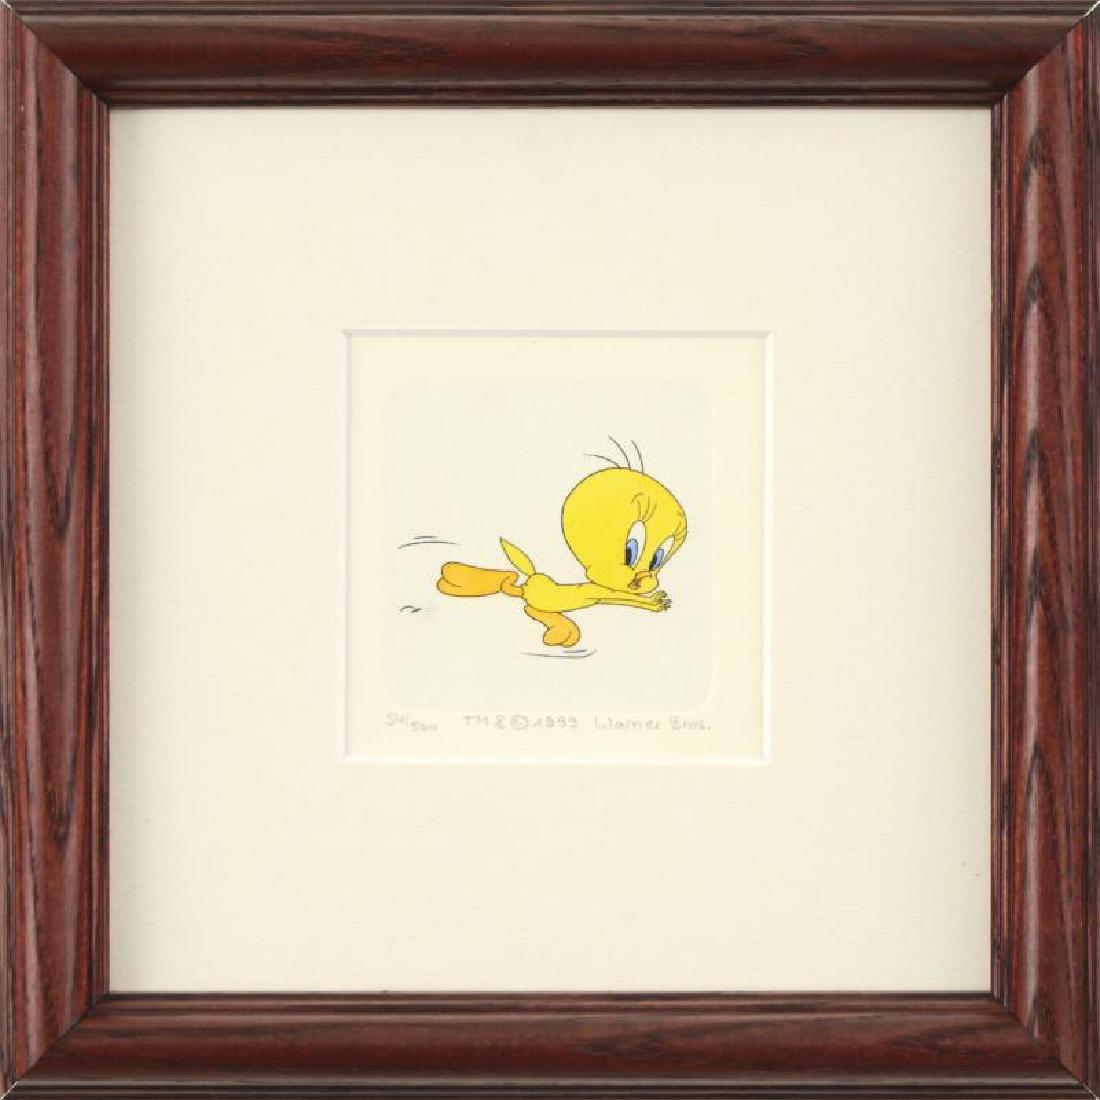 Tweety Bird by Looney Tunes